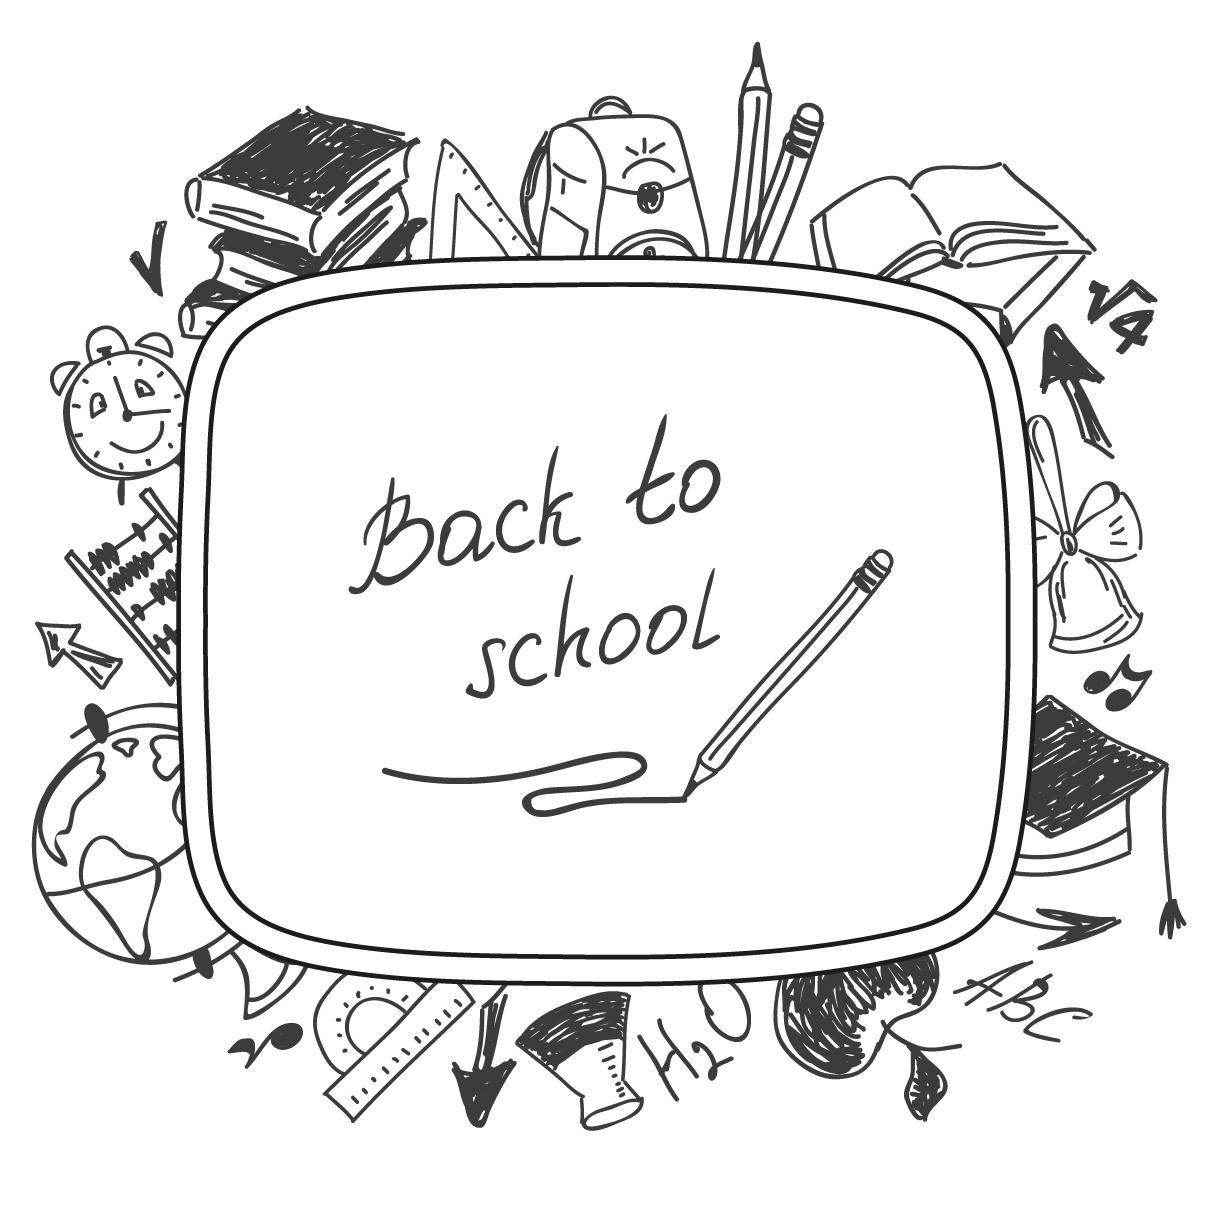 1212x1216 Pencil Sketch Back To School Illustration